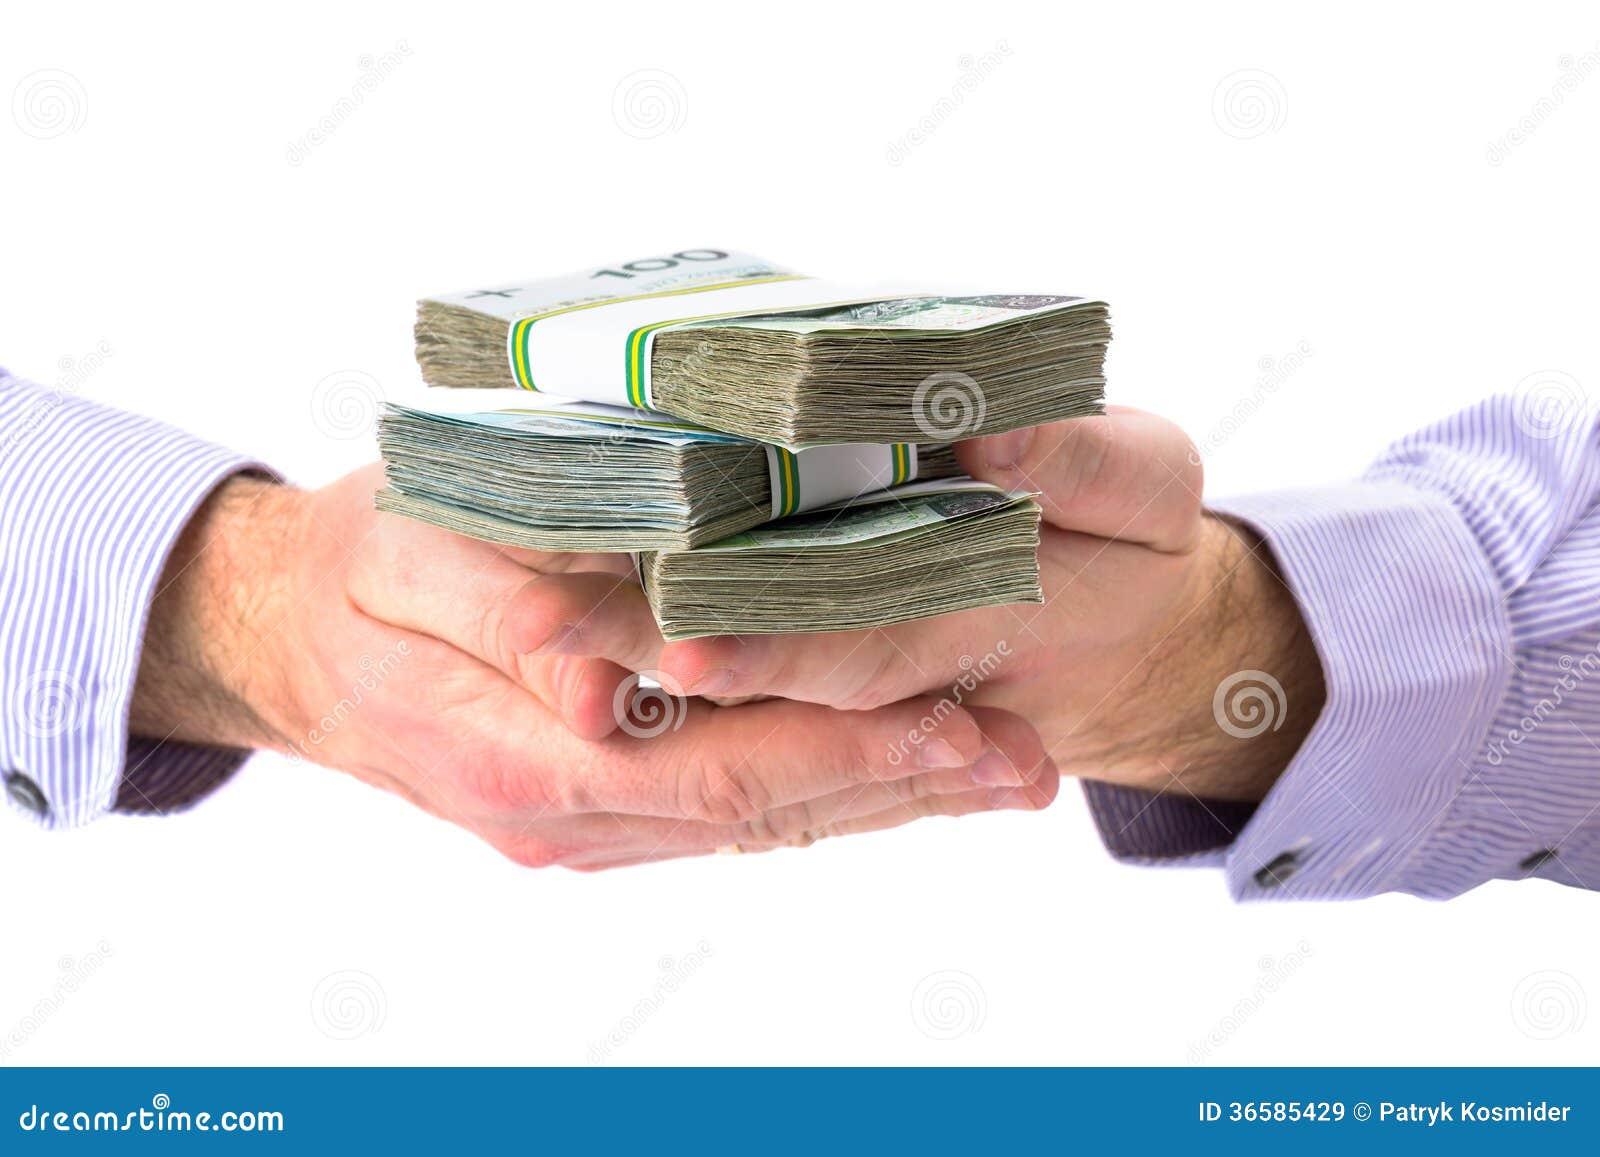 Payday loan north las vegas nv image 8